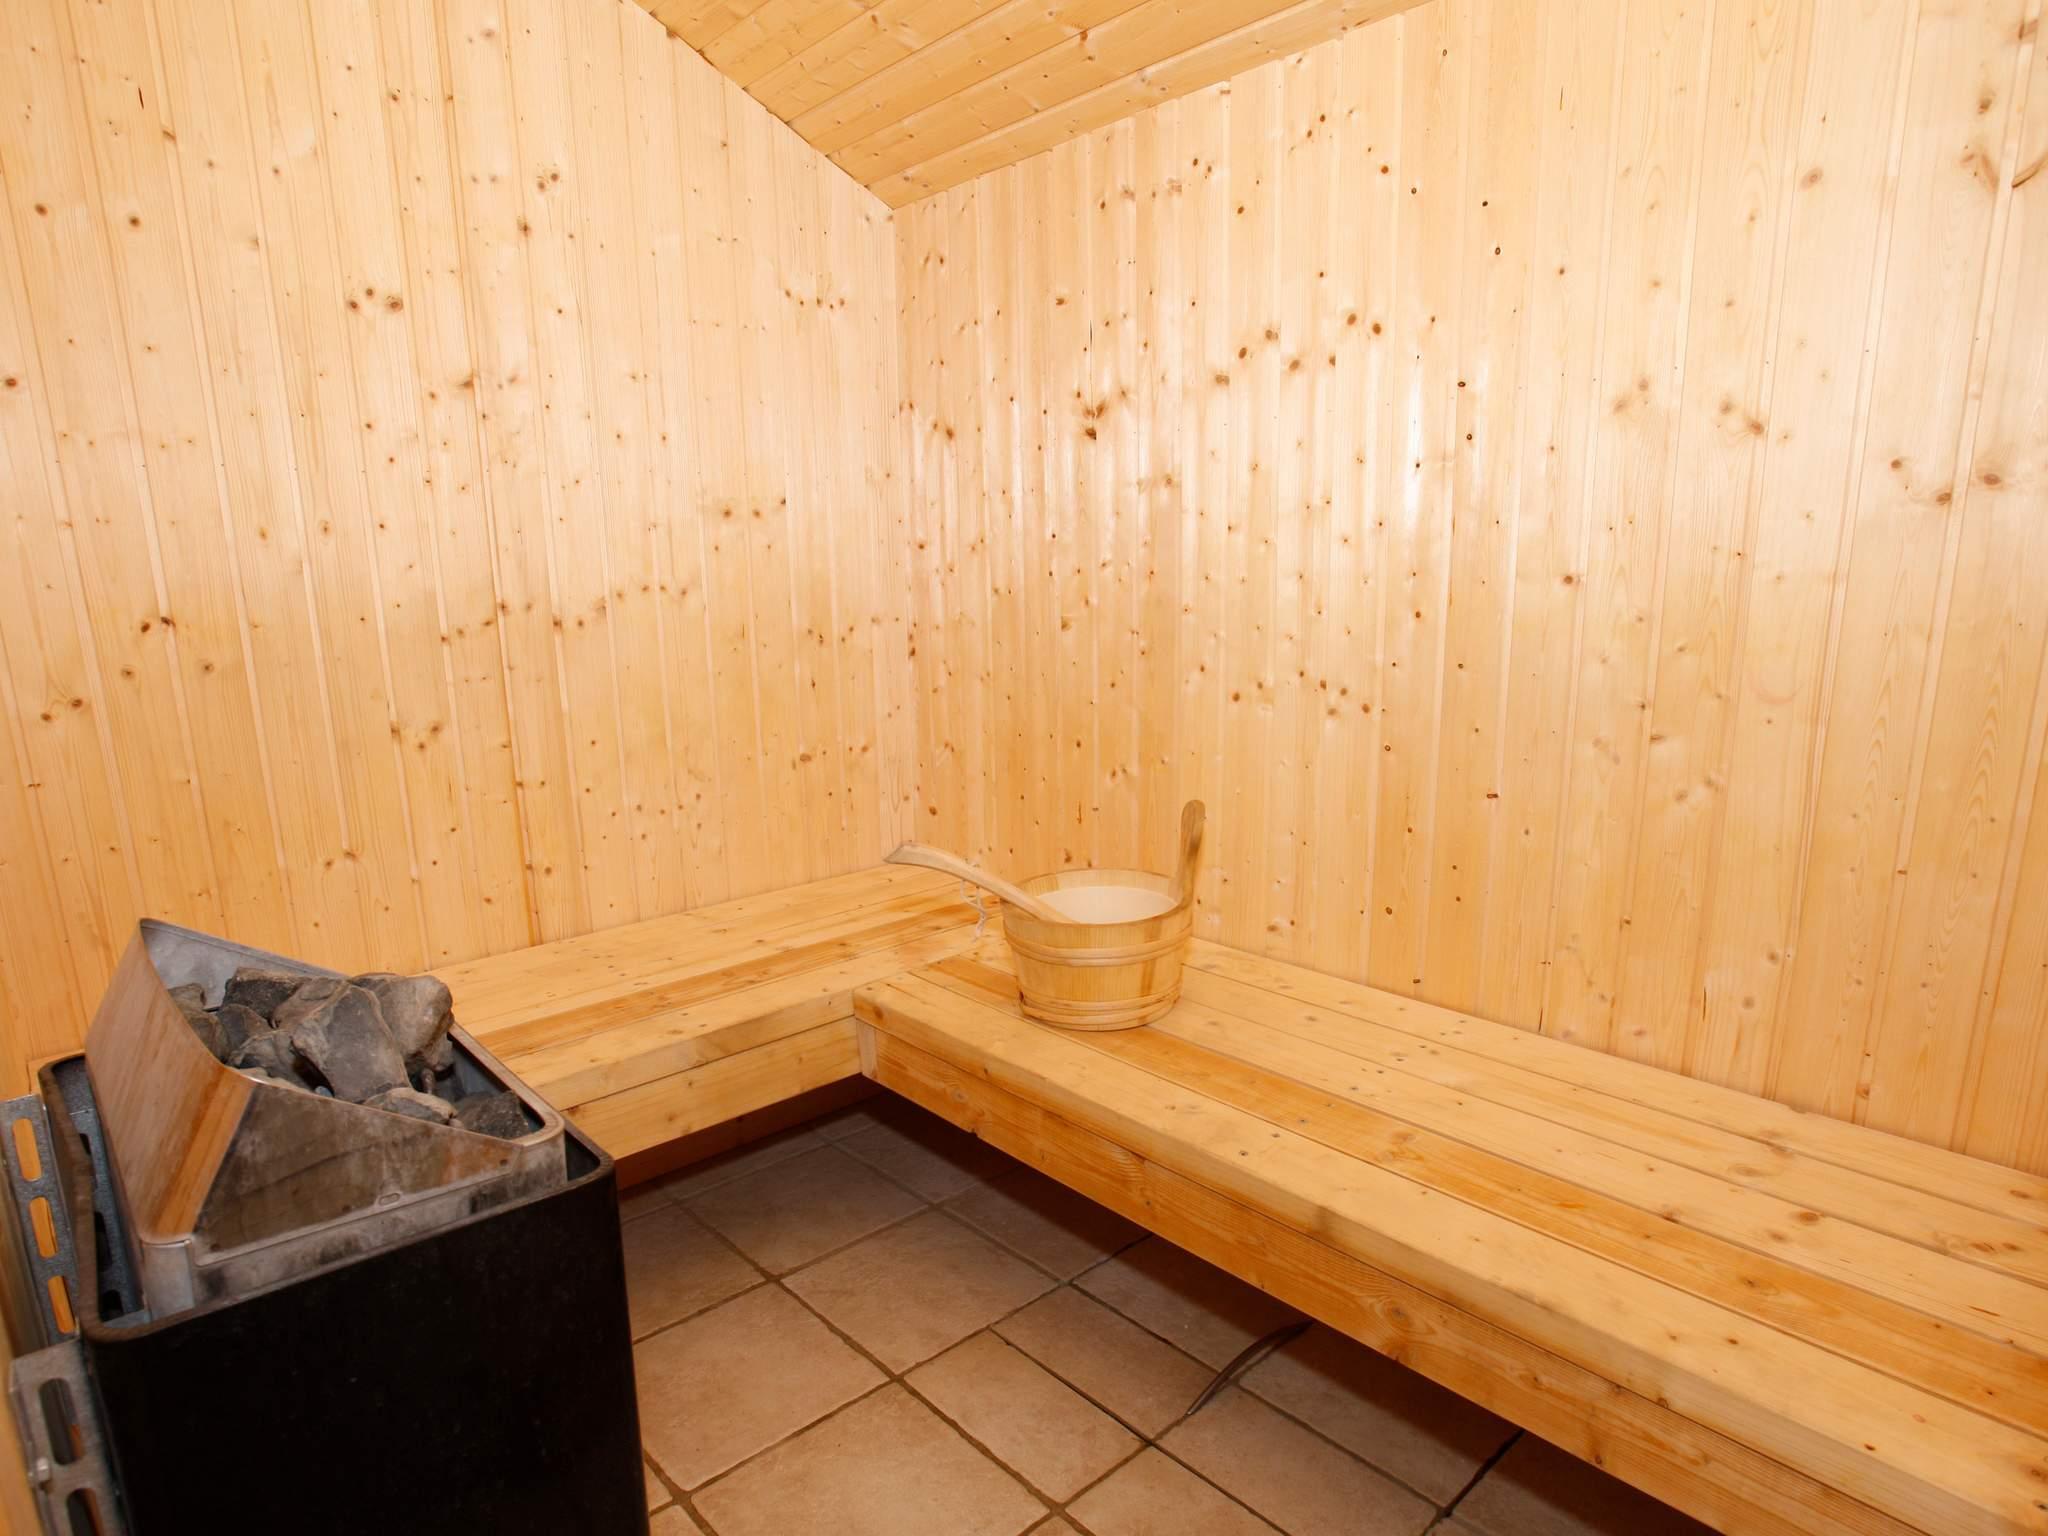 Ferienhaus Øster Hurup (681777), Øster Hurup, , Ostjütland, Dänemark, Bild 14